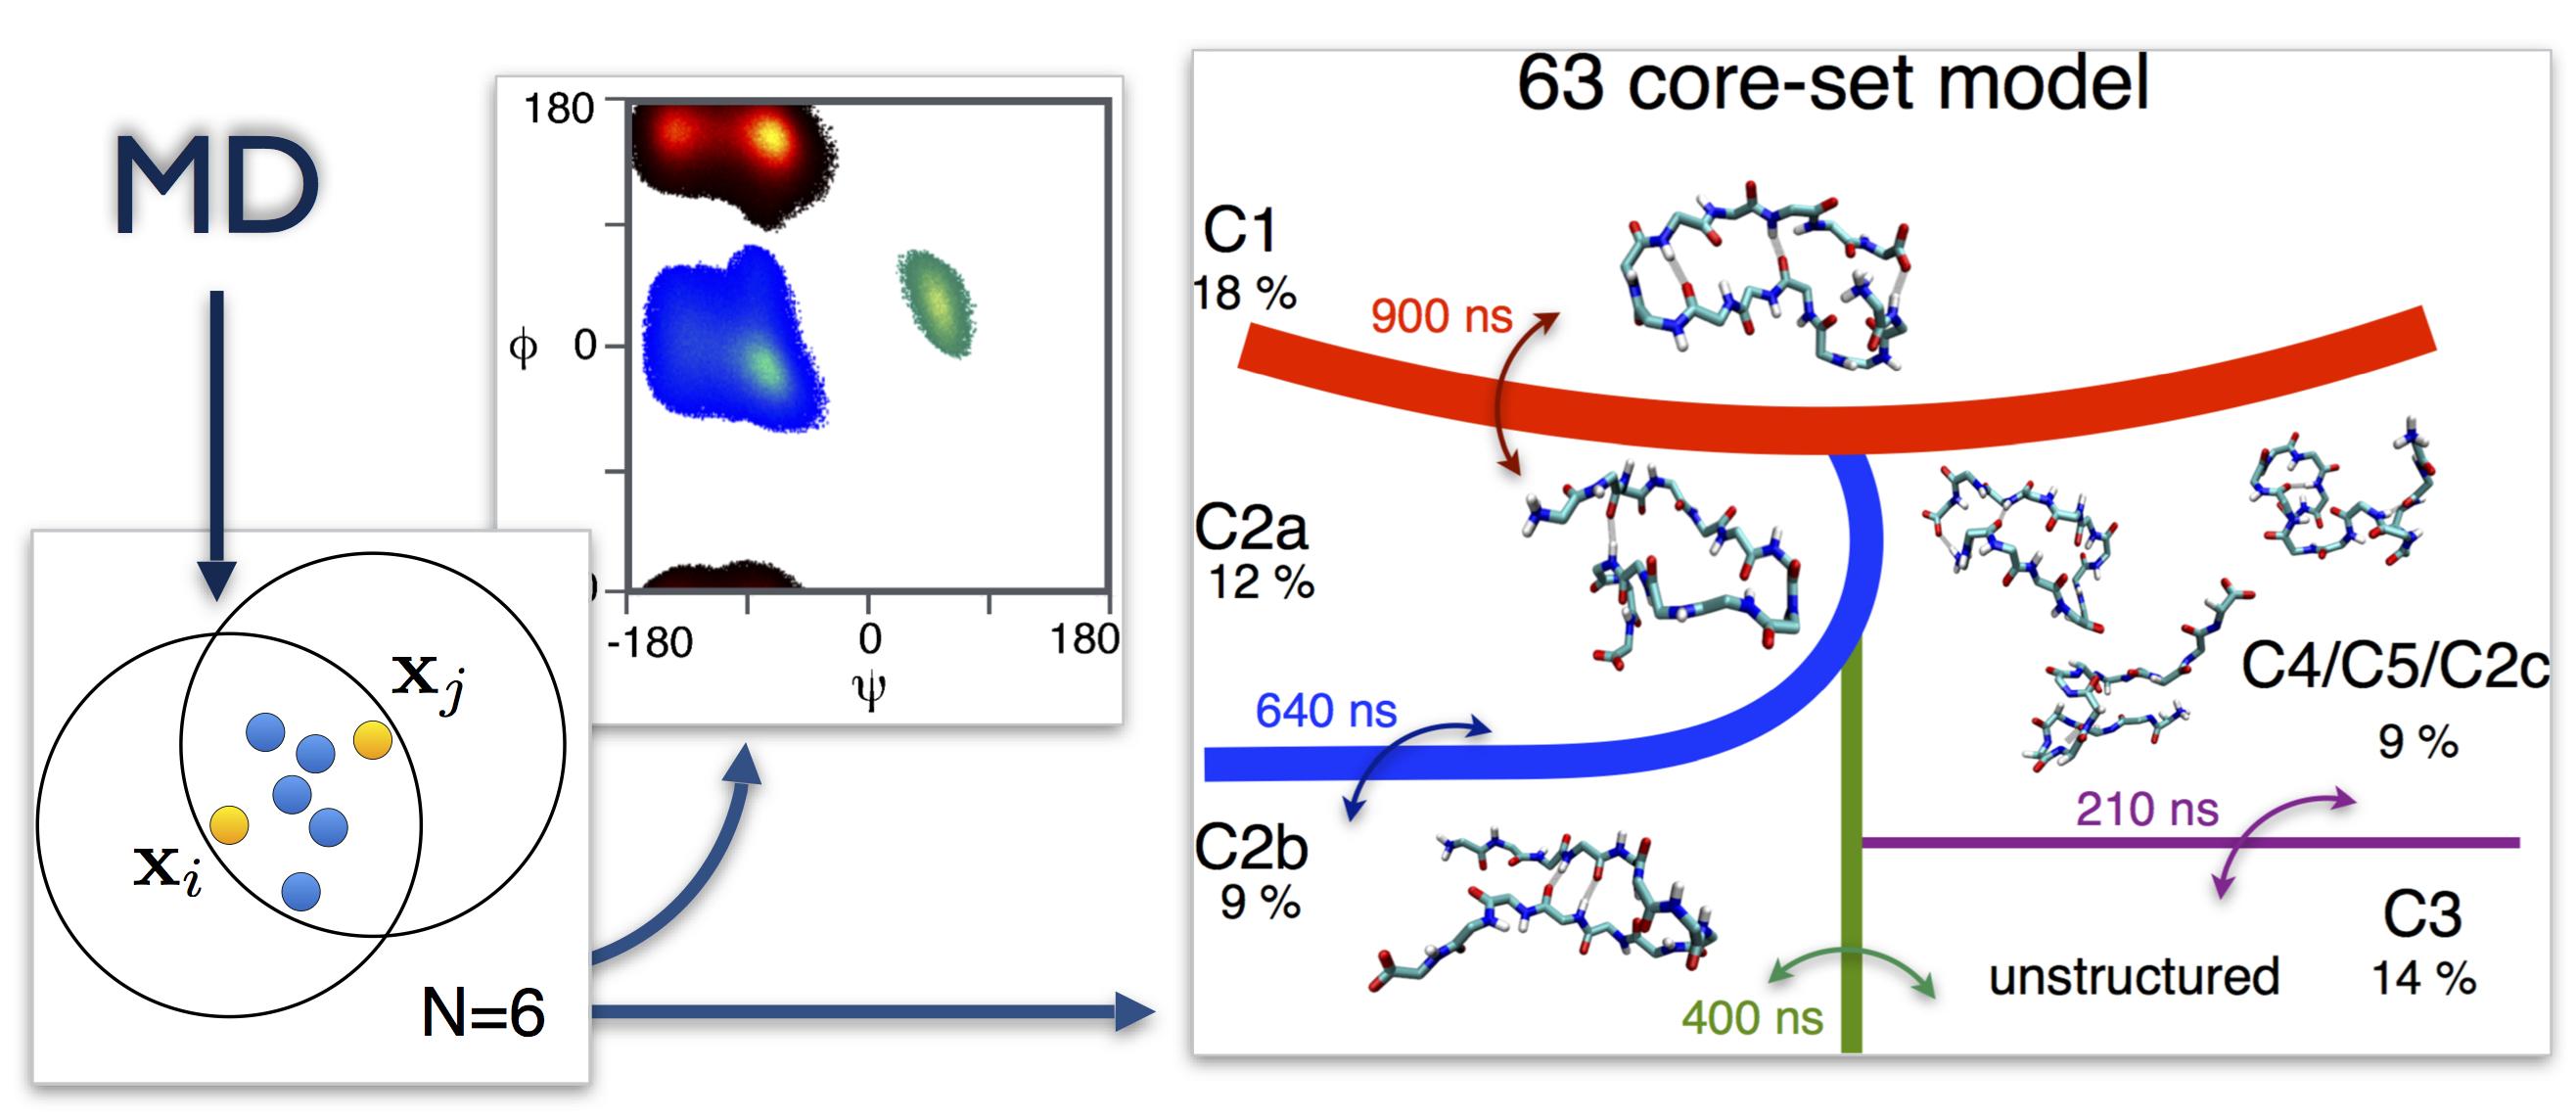 Density-based cluster algorithms for the identification of core sets